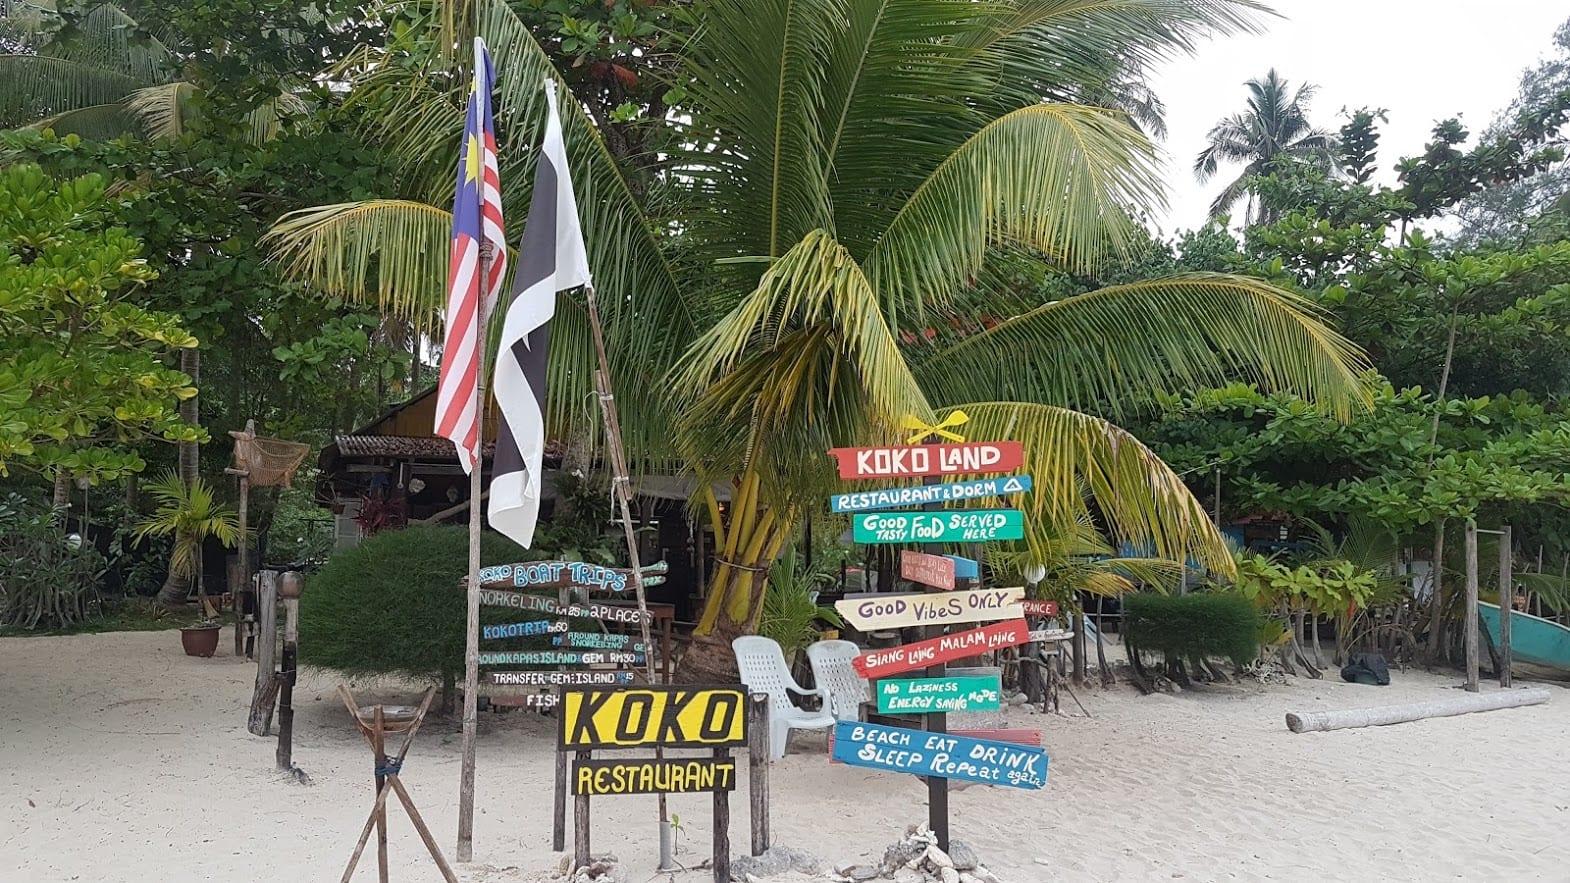 Koko restaurant on Kapas Island Malaysia